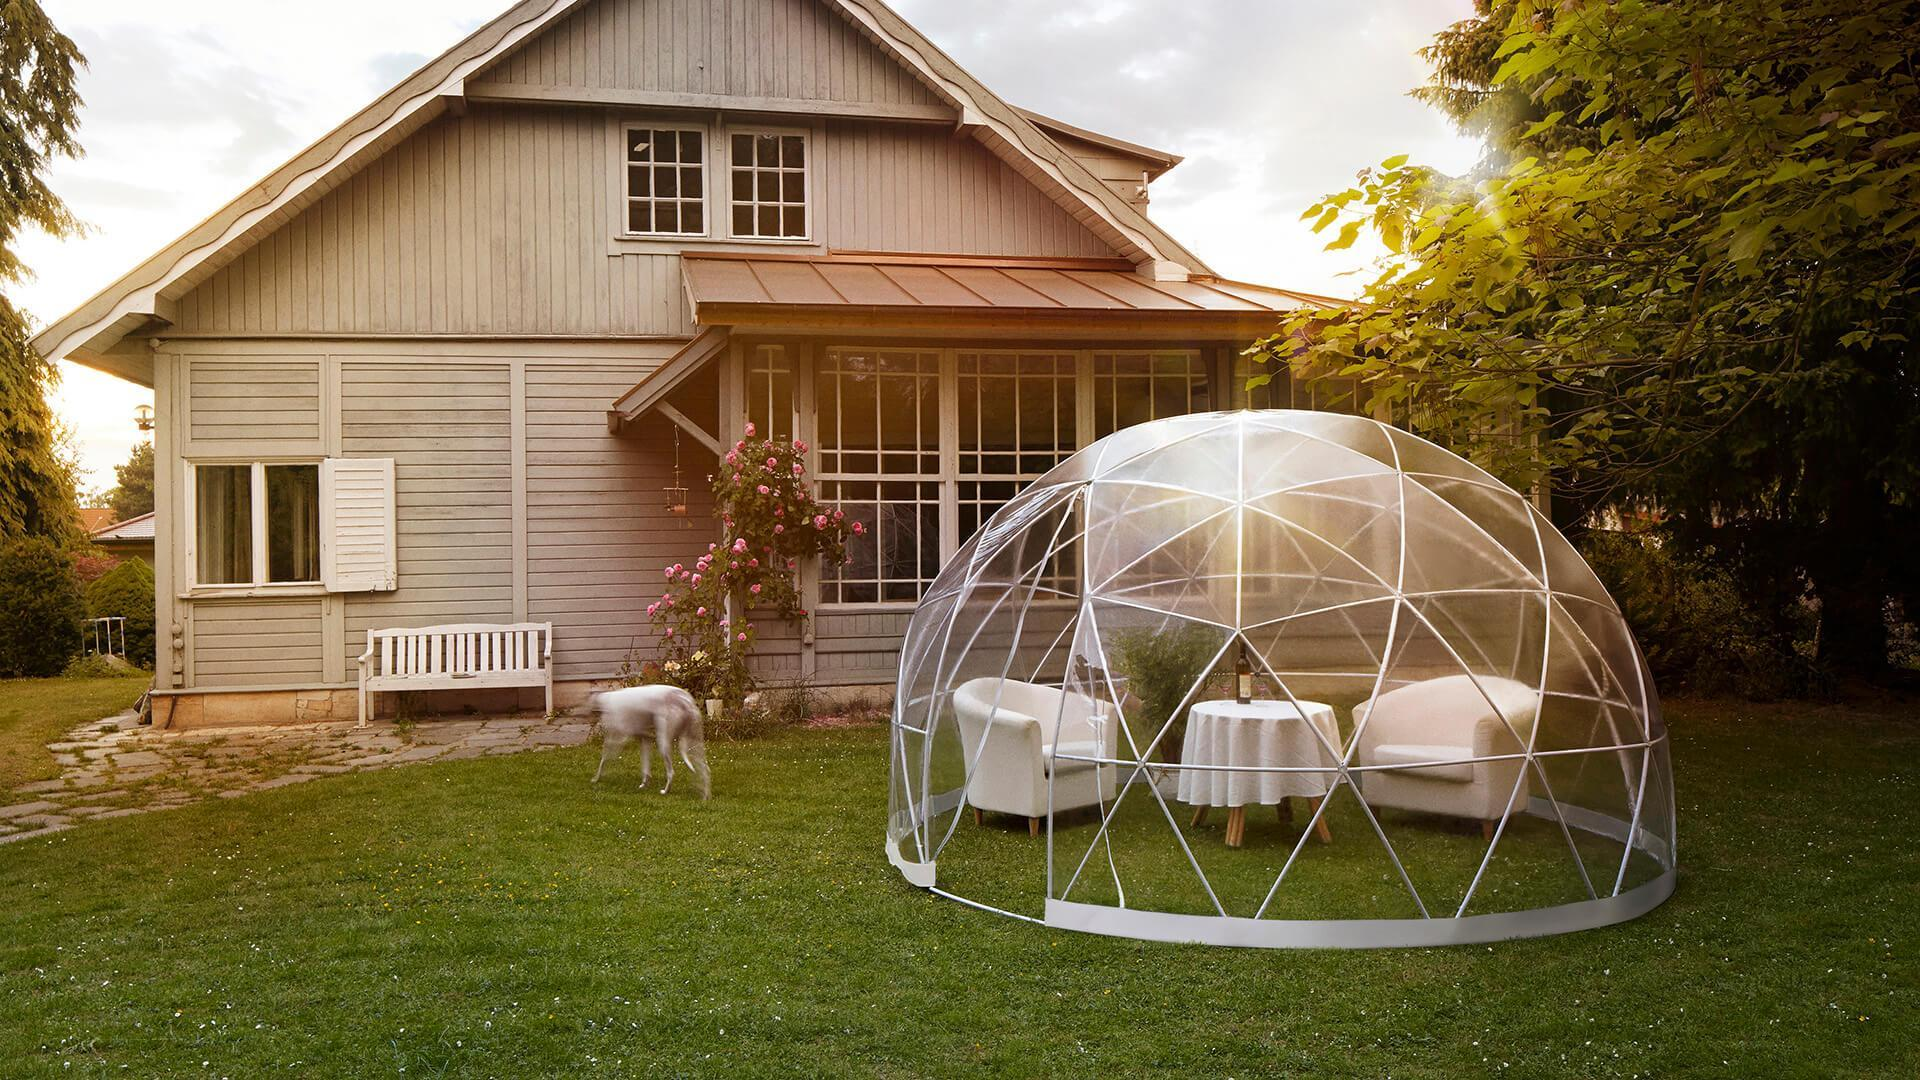 Garden Igloo | Garden Igloo - Stylish Conservatory, Greenhouse, Hot Tub  Cover, Gazebo